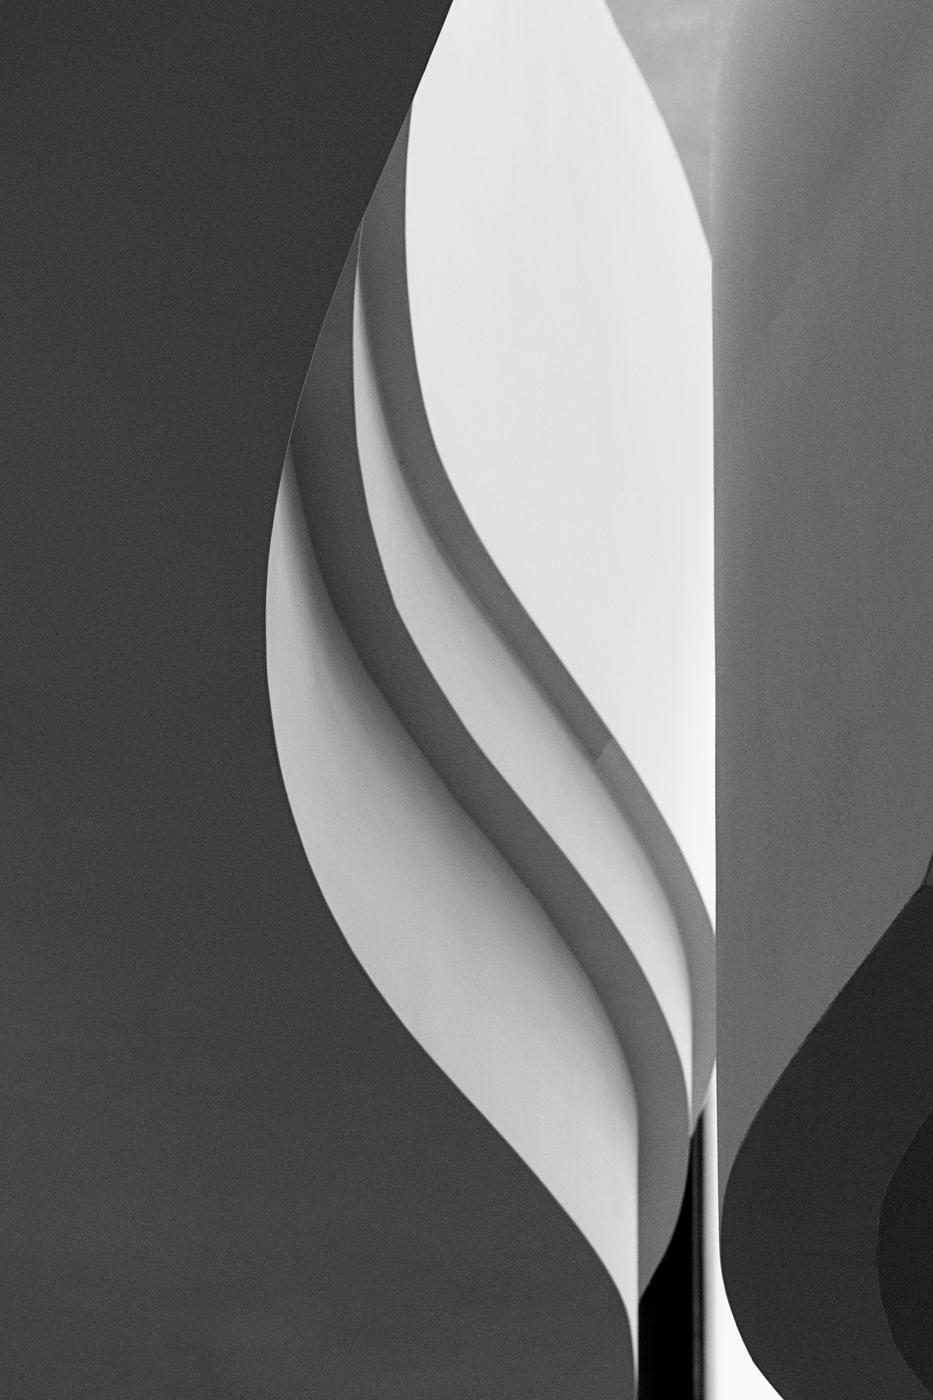 Tulip © Angie McMonigal